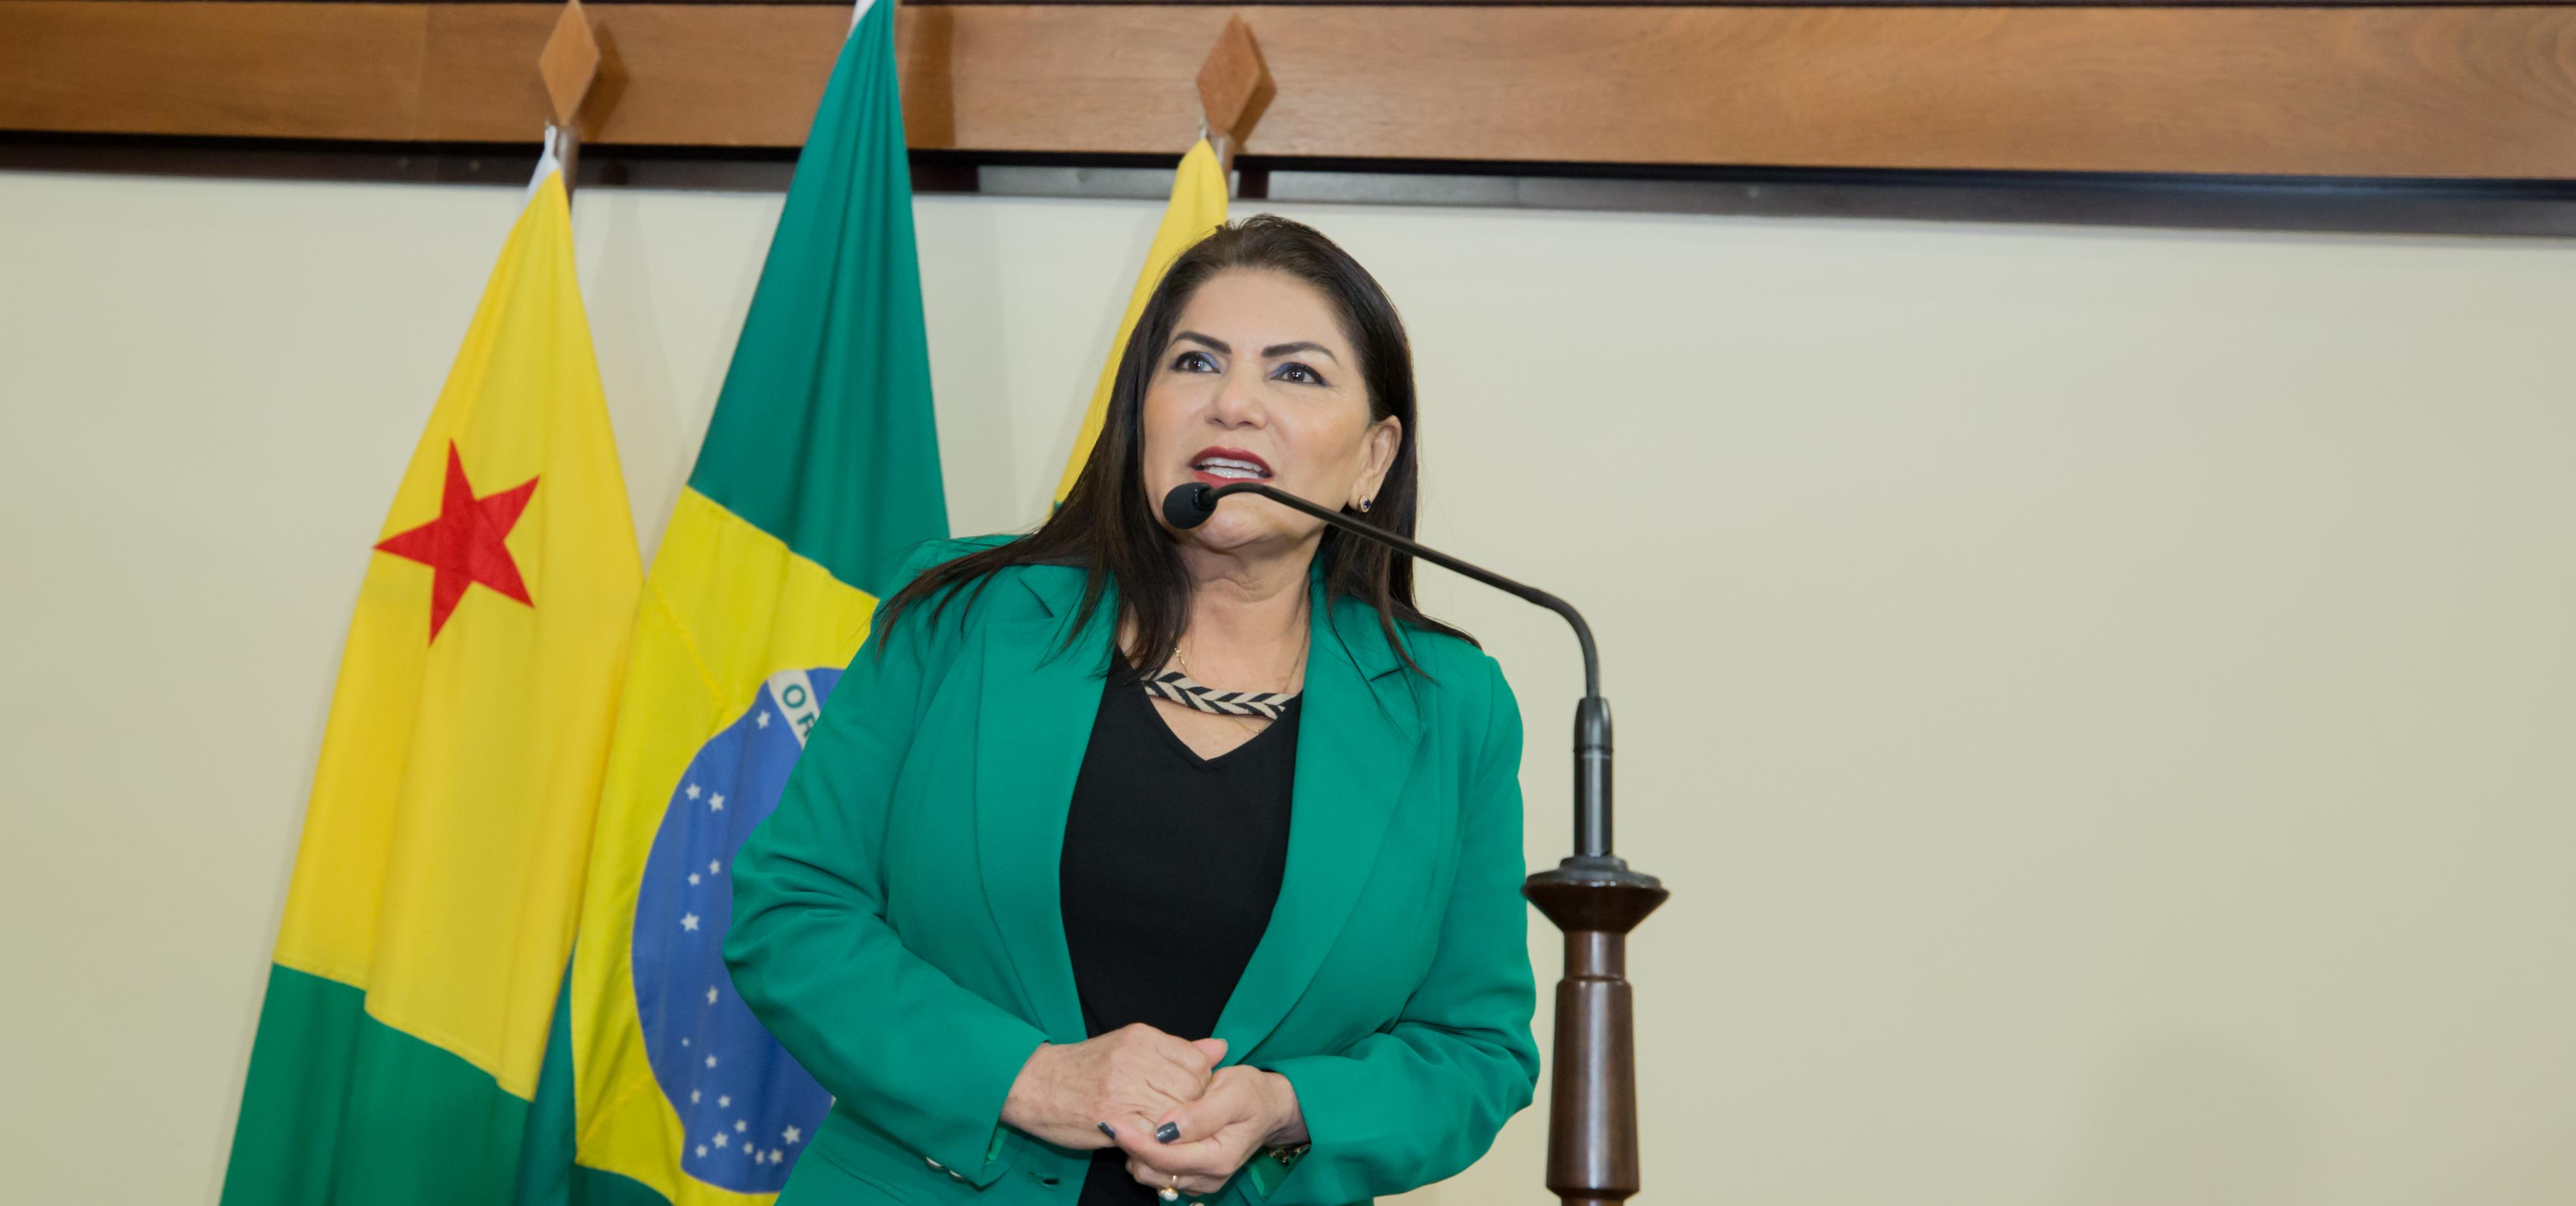 Antonia Sales diz que desigualdade salarial na polícia precisa ser corrigida